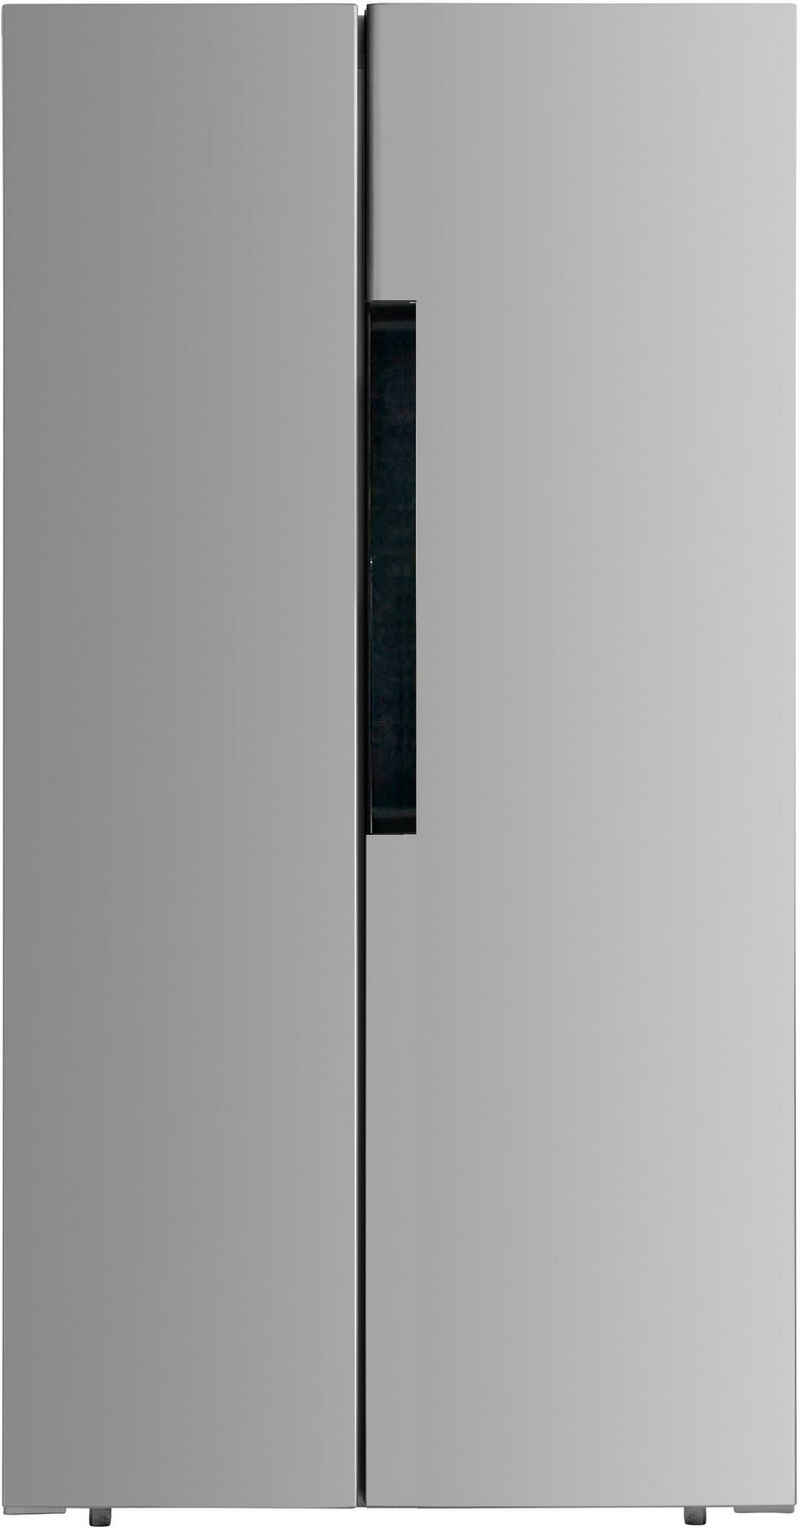 PKM Side-by-Side SBS440.4A+NF SI, 178 cm hoch, 83,6 cm breit